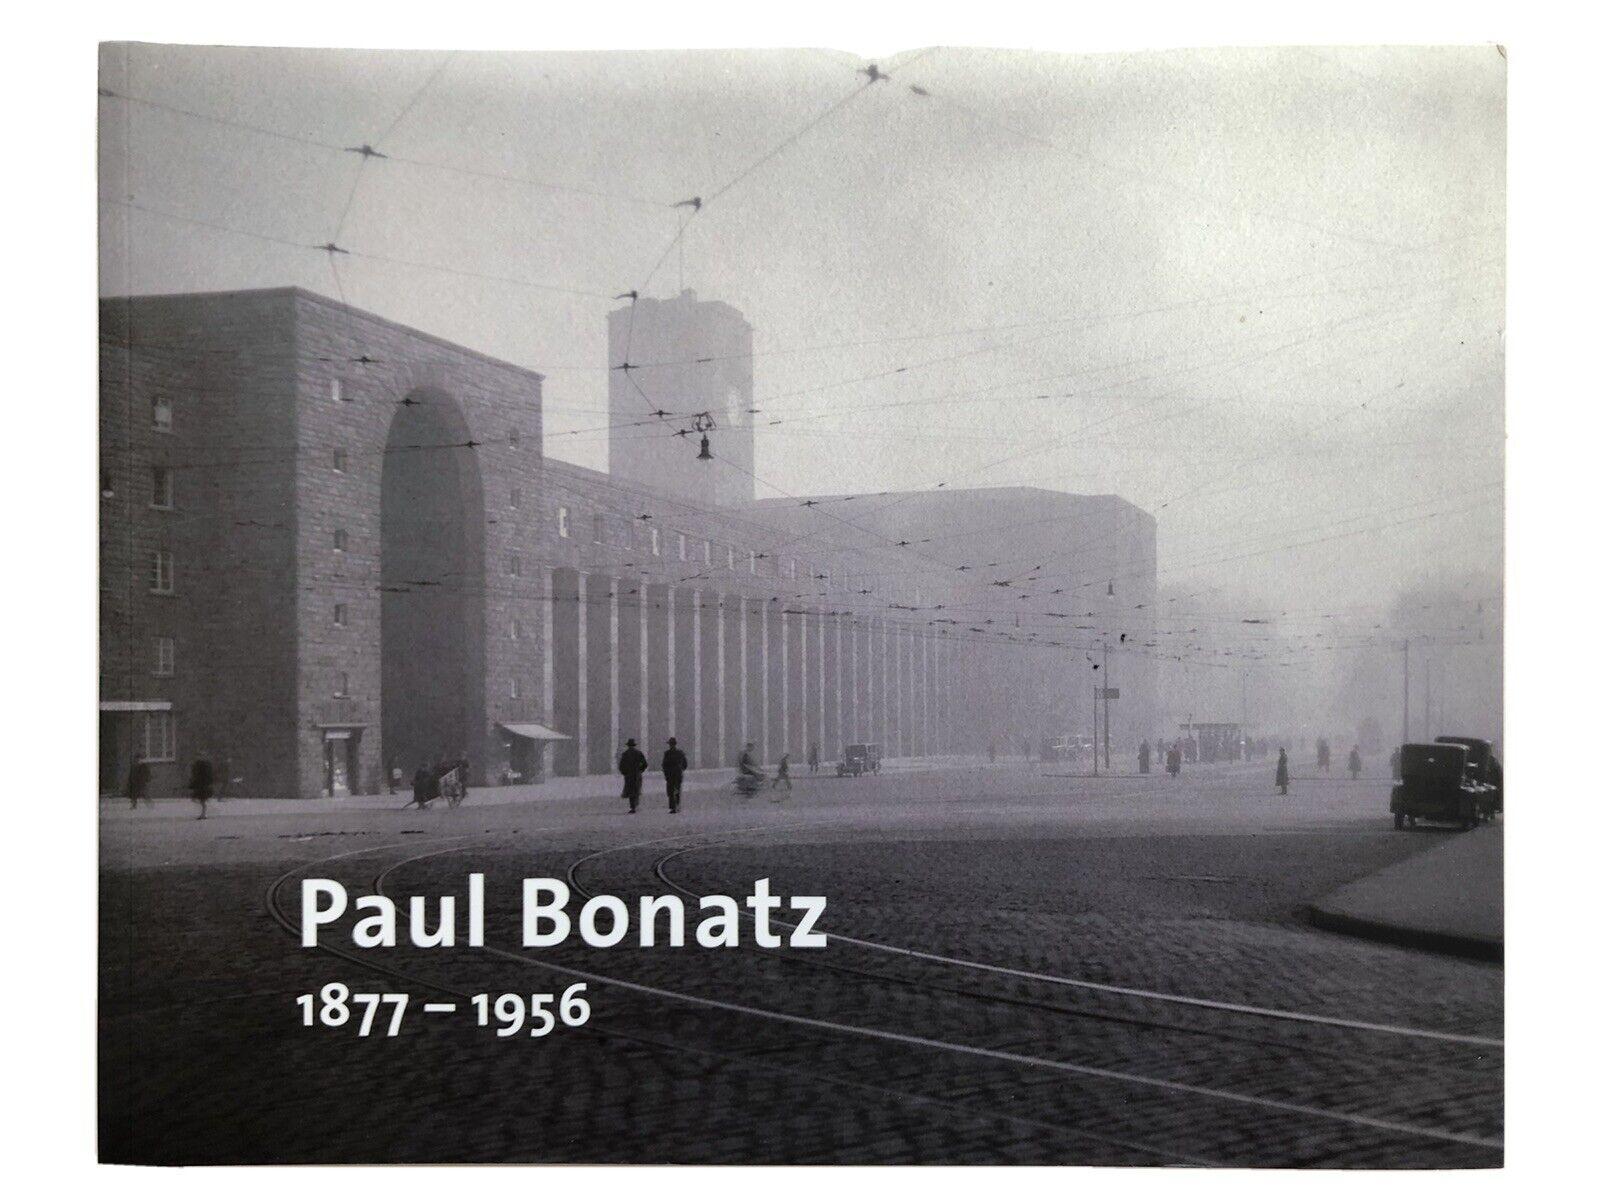 Paul Bonatz 1877-1956 Wolfgang Voigt, Roland May, Architekt umfassender Bildband - Wolfgang Voigt Roland May